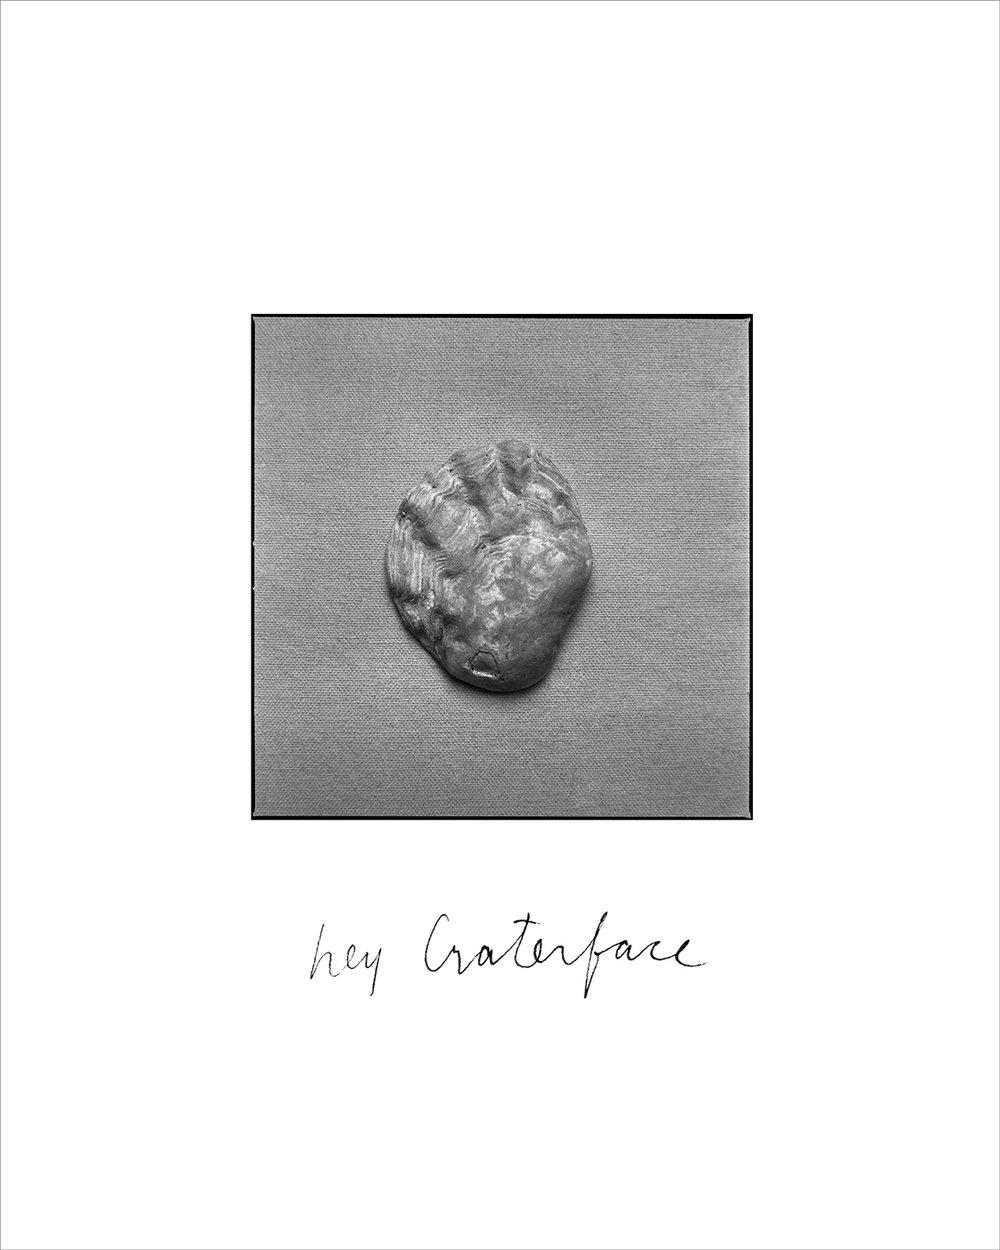 heycraterface2.jpg